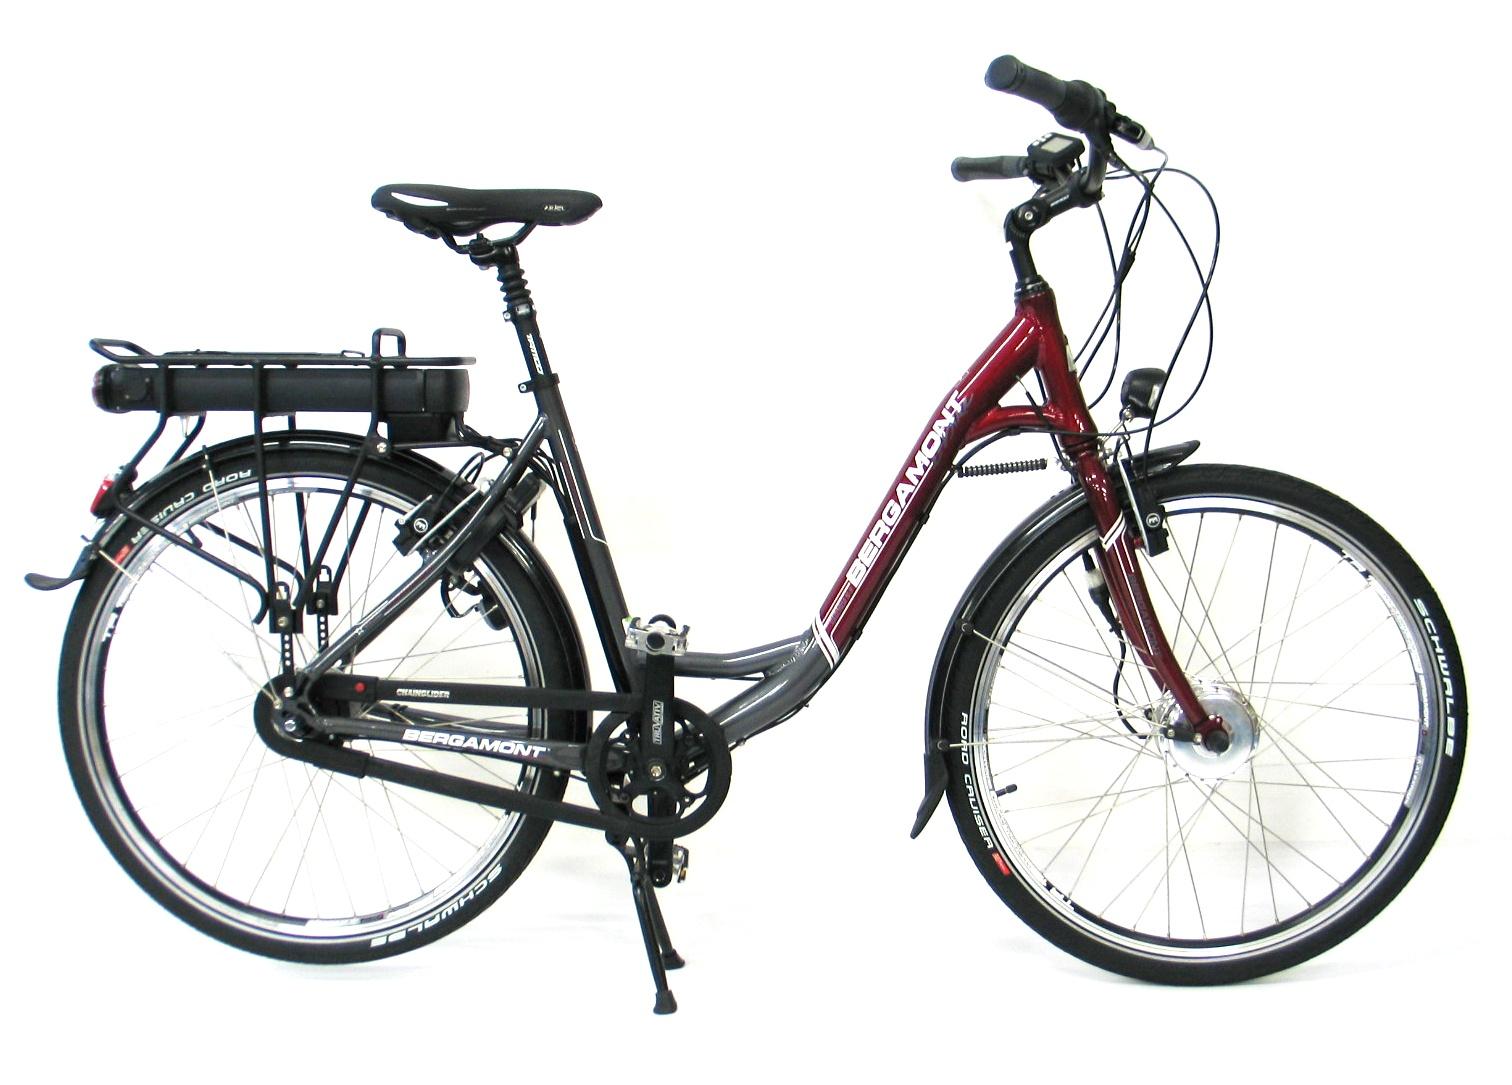 "Elektrokolo Bergamont E-line + cyklopumpa BFP-21 za 699 Kč zdarma šedo-červená, 17"", kola 26"", rám 44 cm"